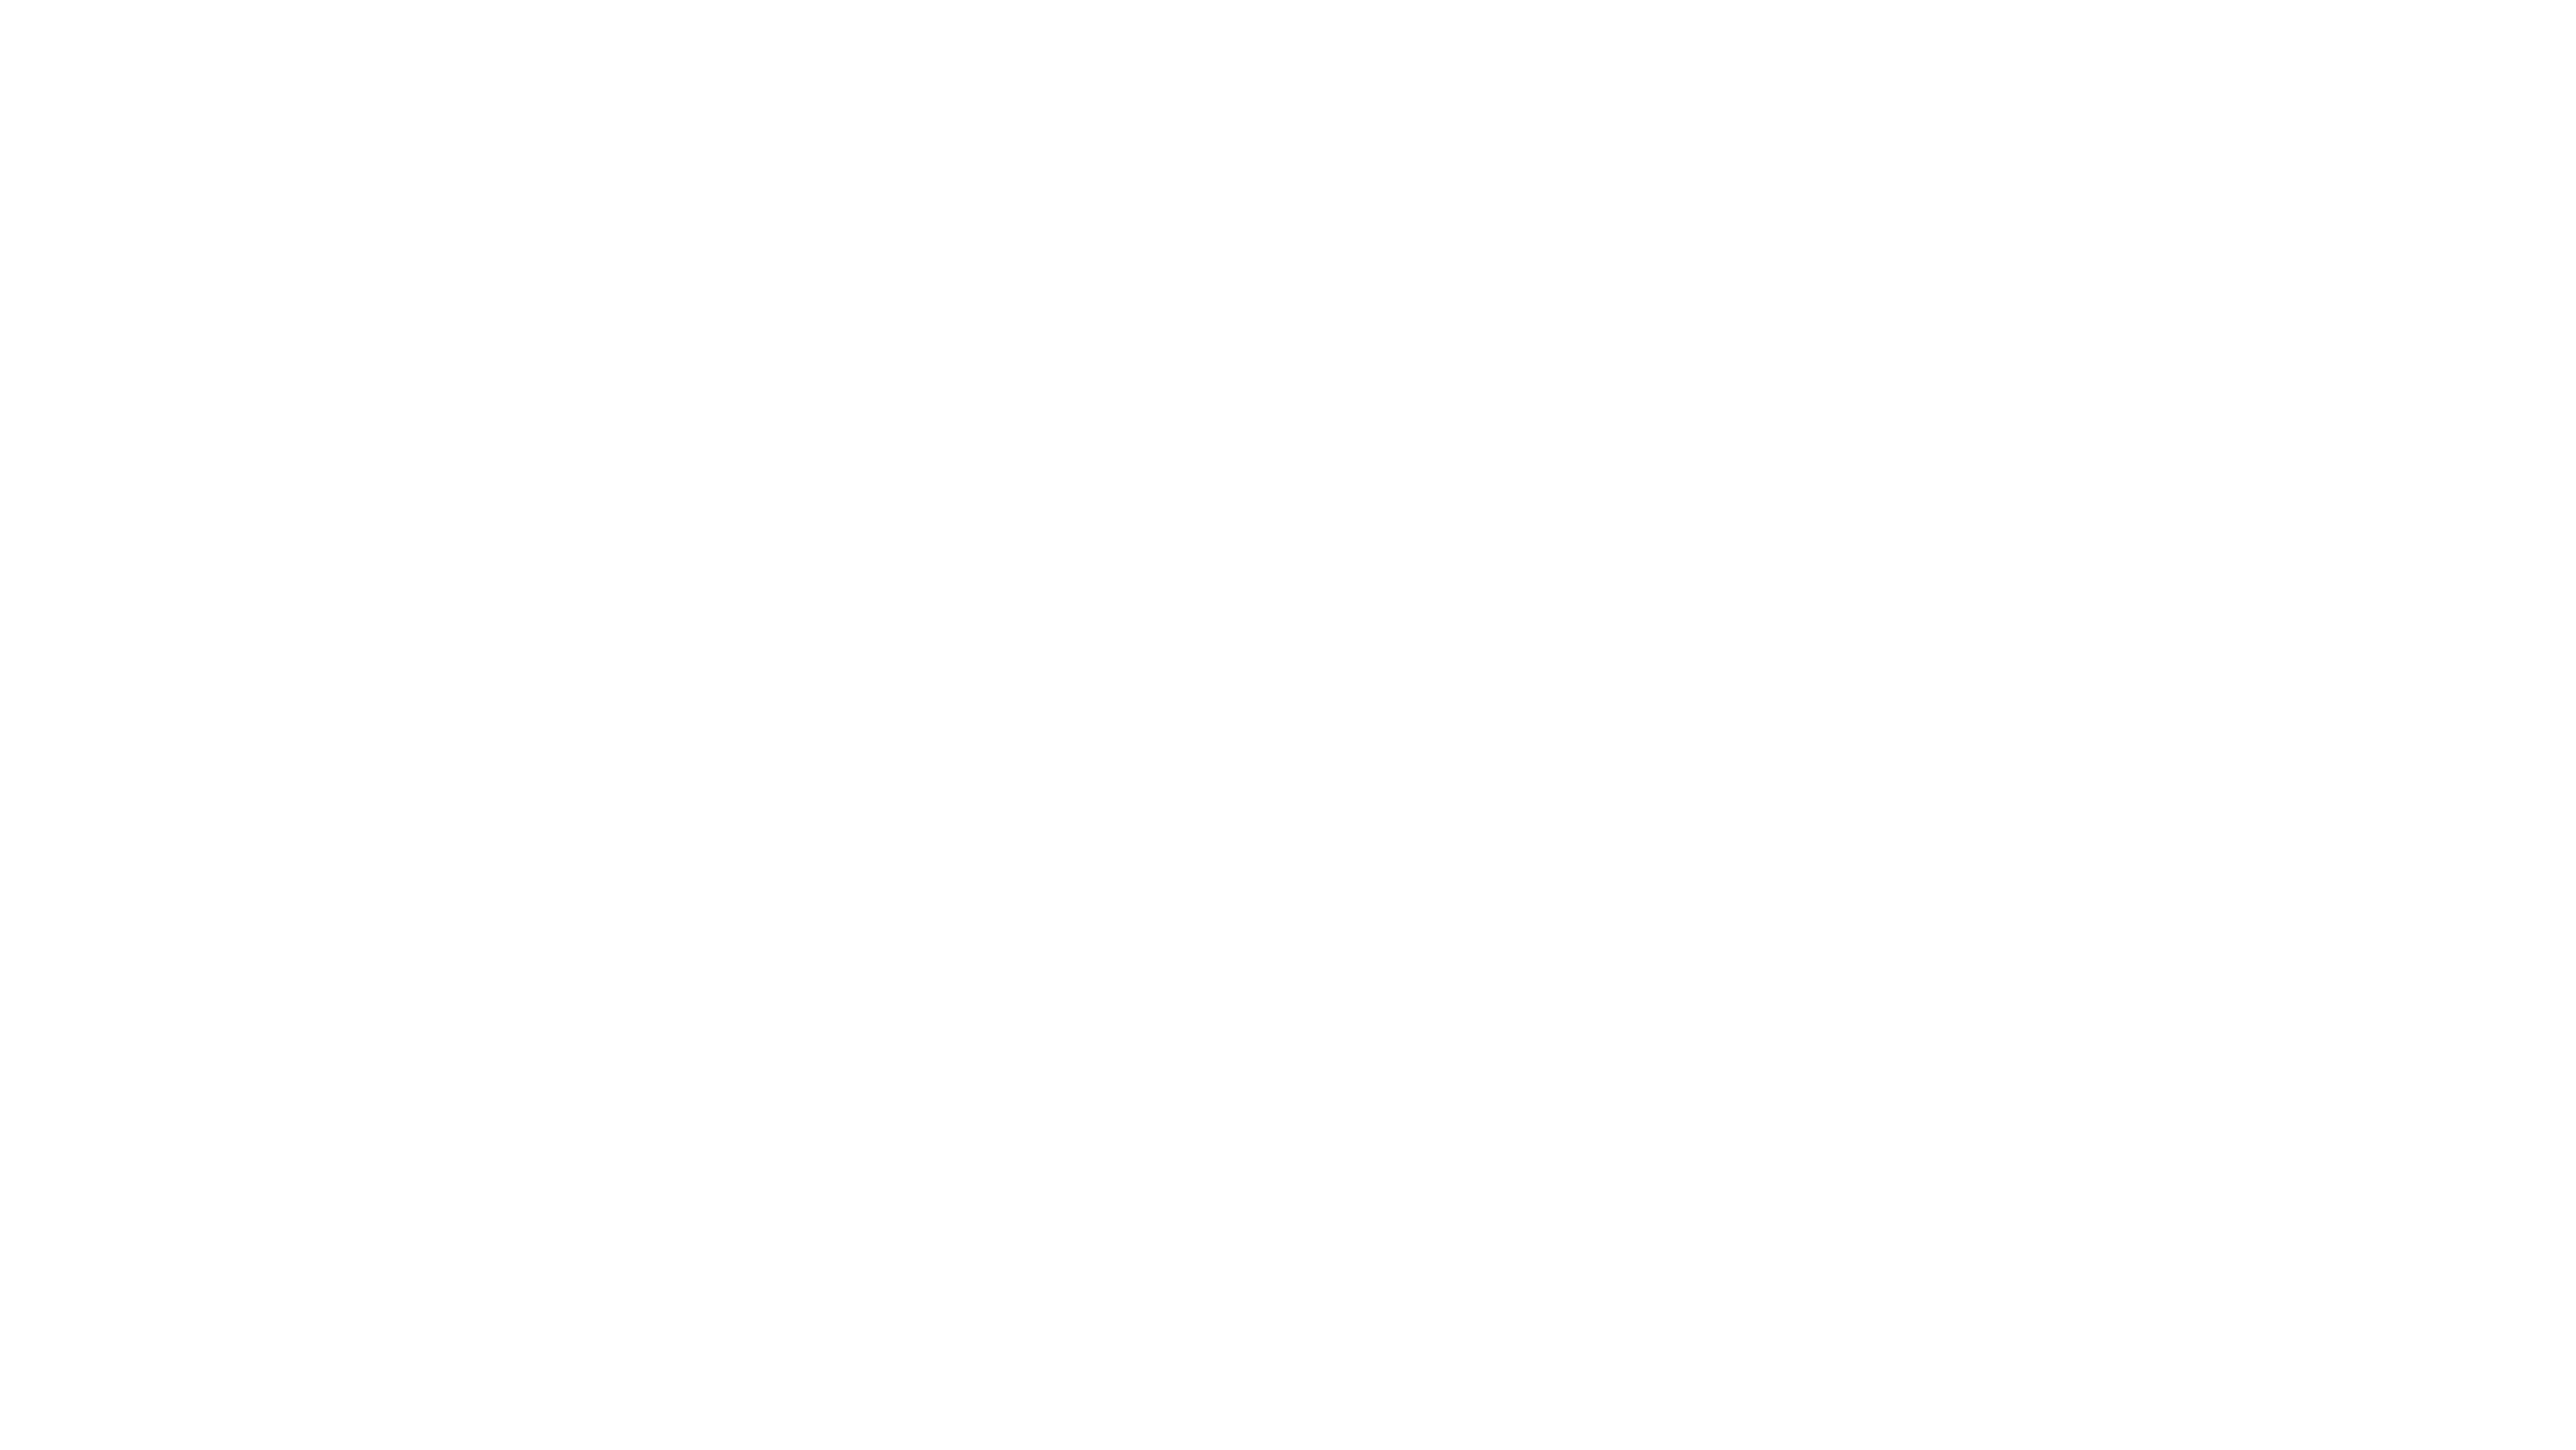 visualisieren3